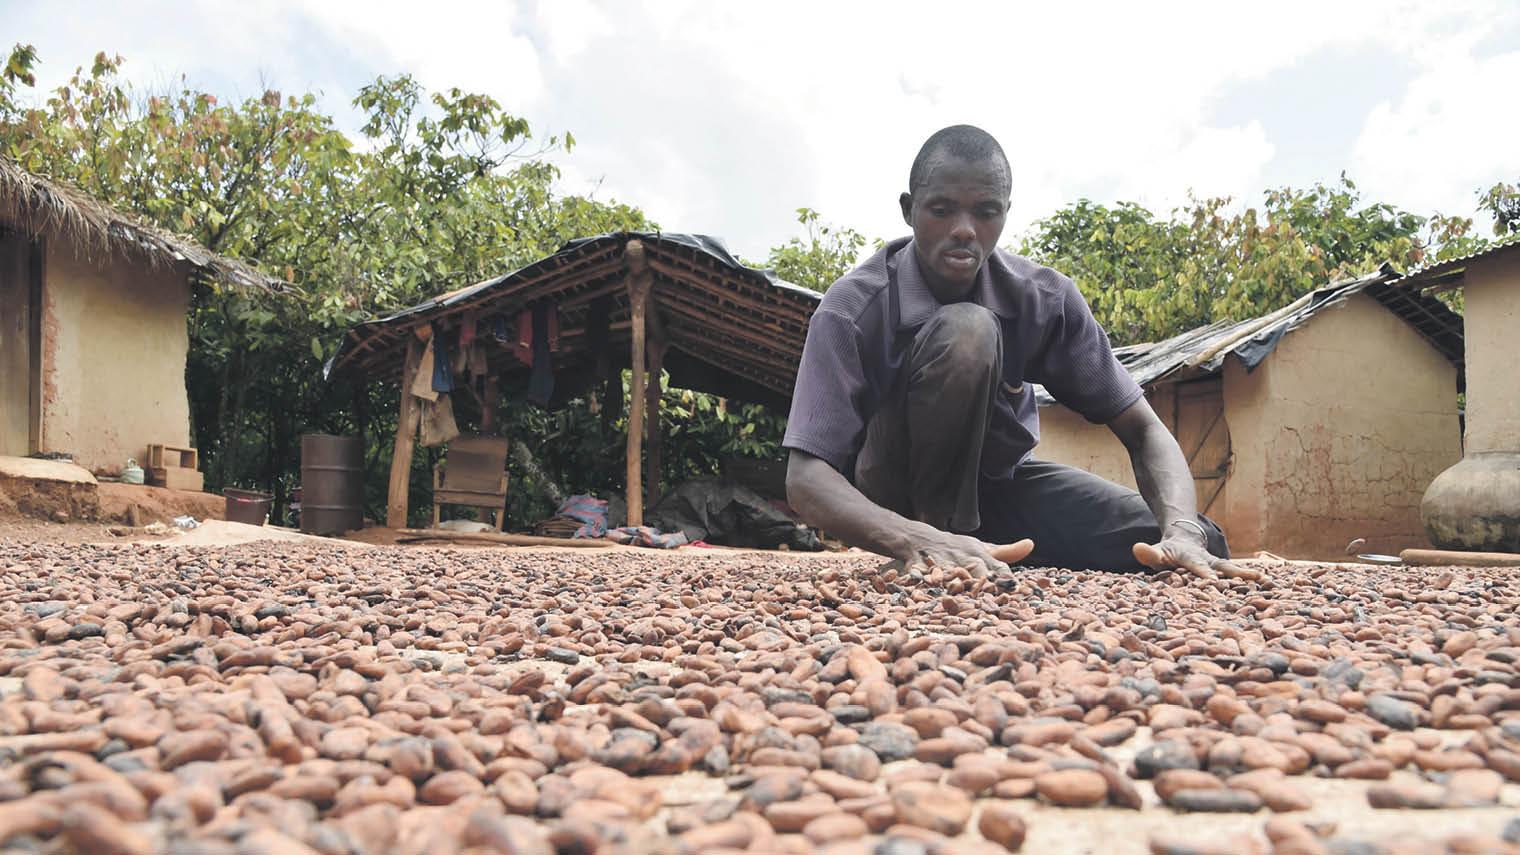 Cocoa farmer crouching working